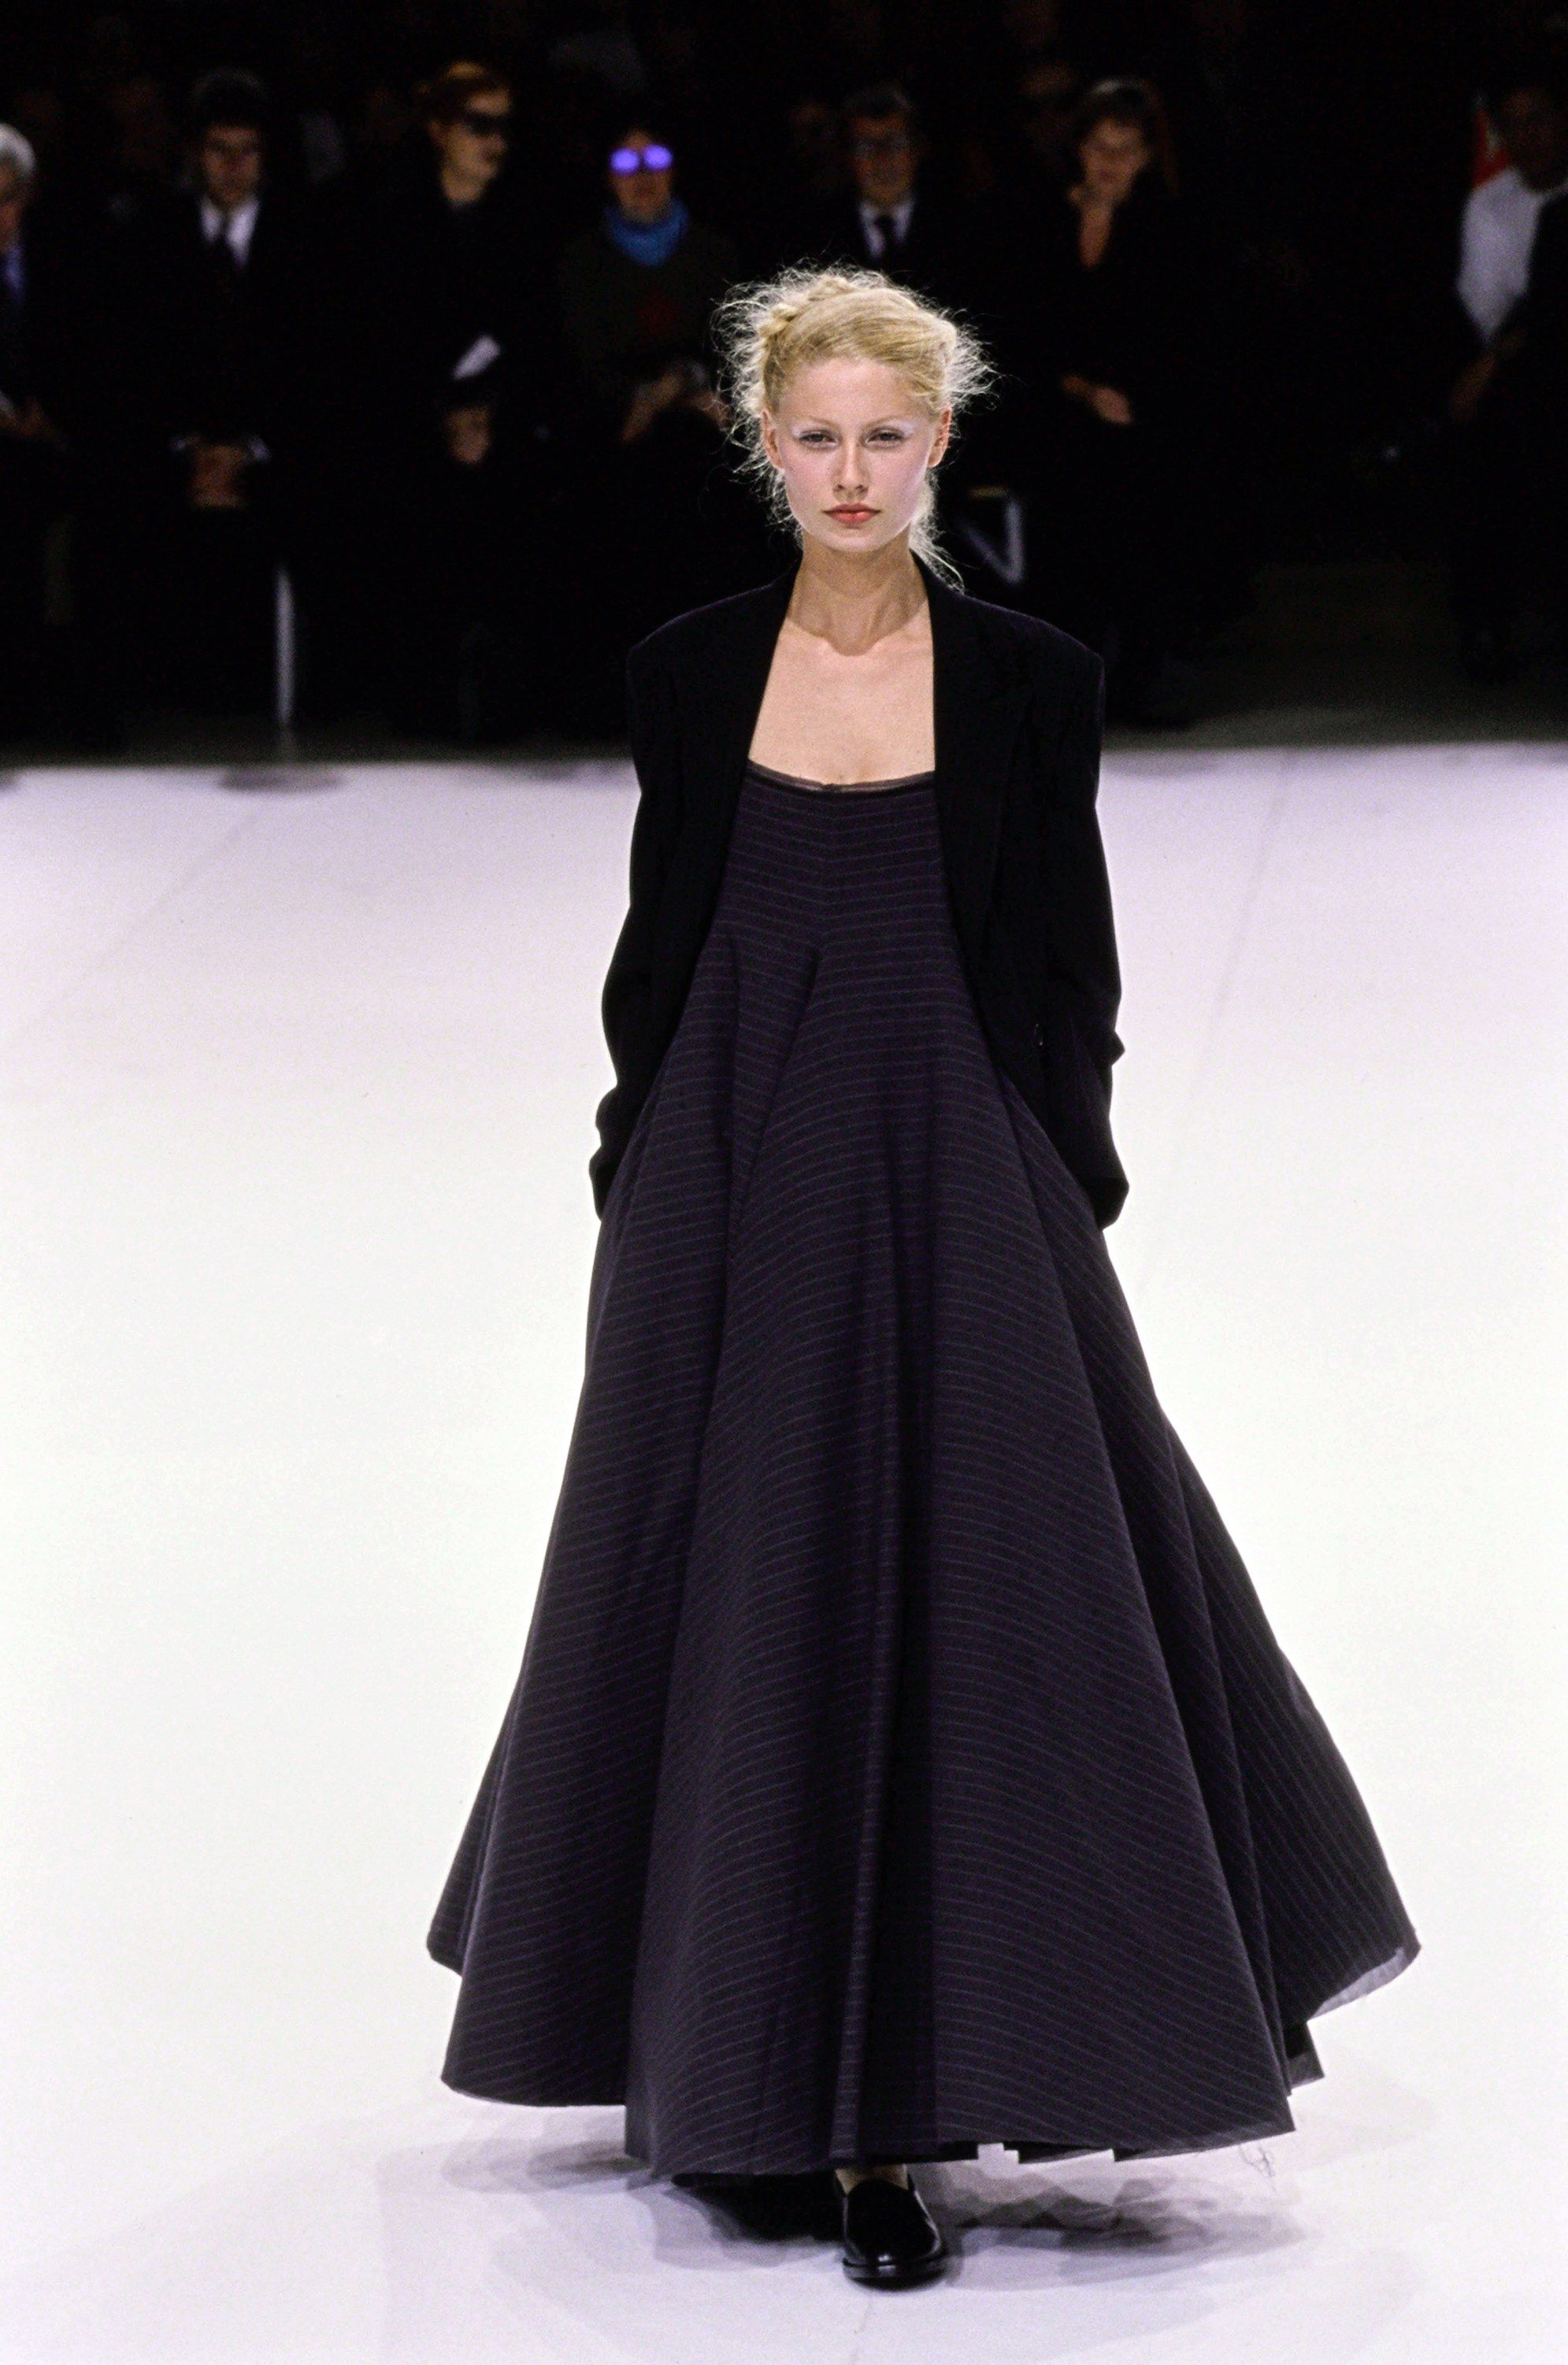 Yohji Yamamoto Spring 1999 Ready-to-Wear Fashion Show - Kirsty Hume